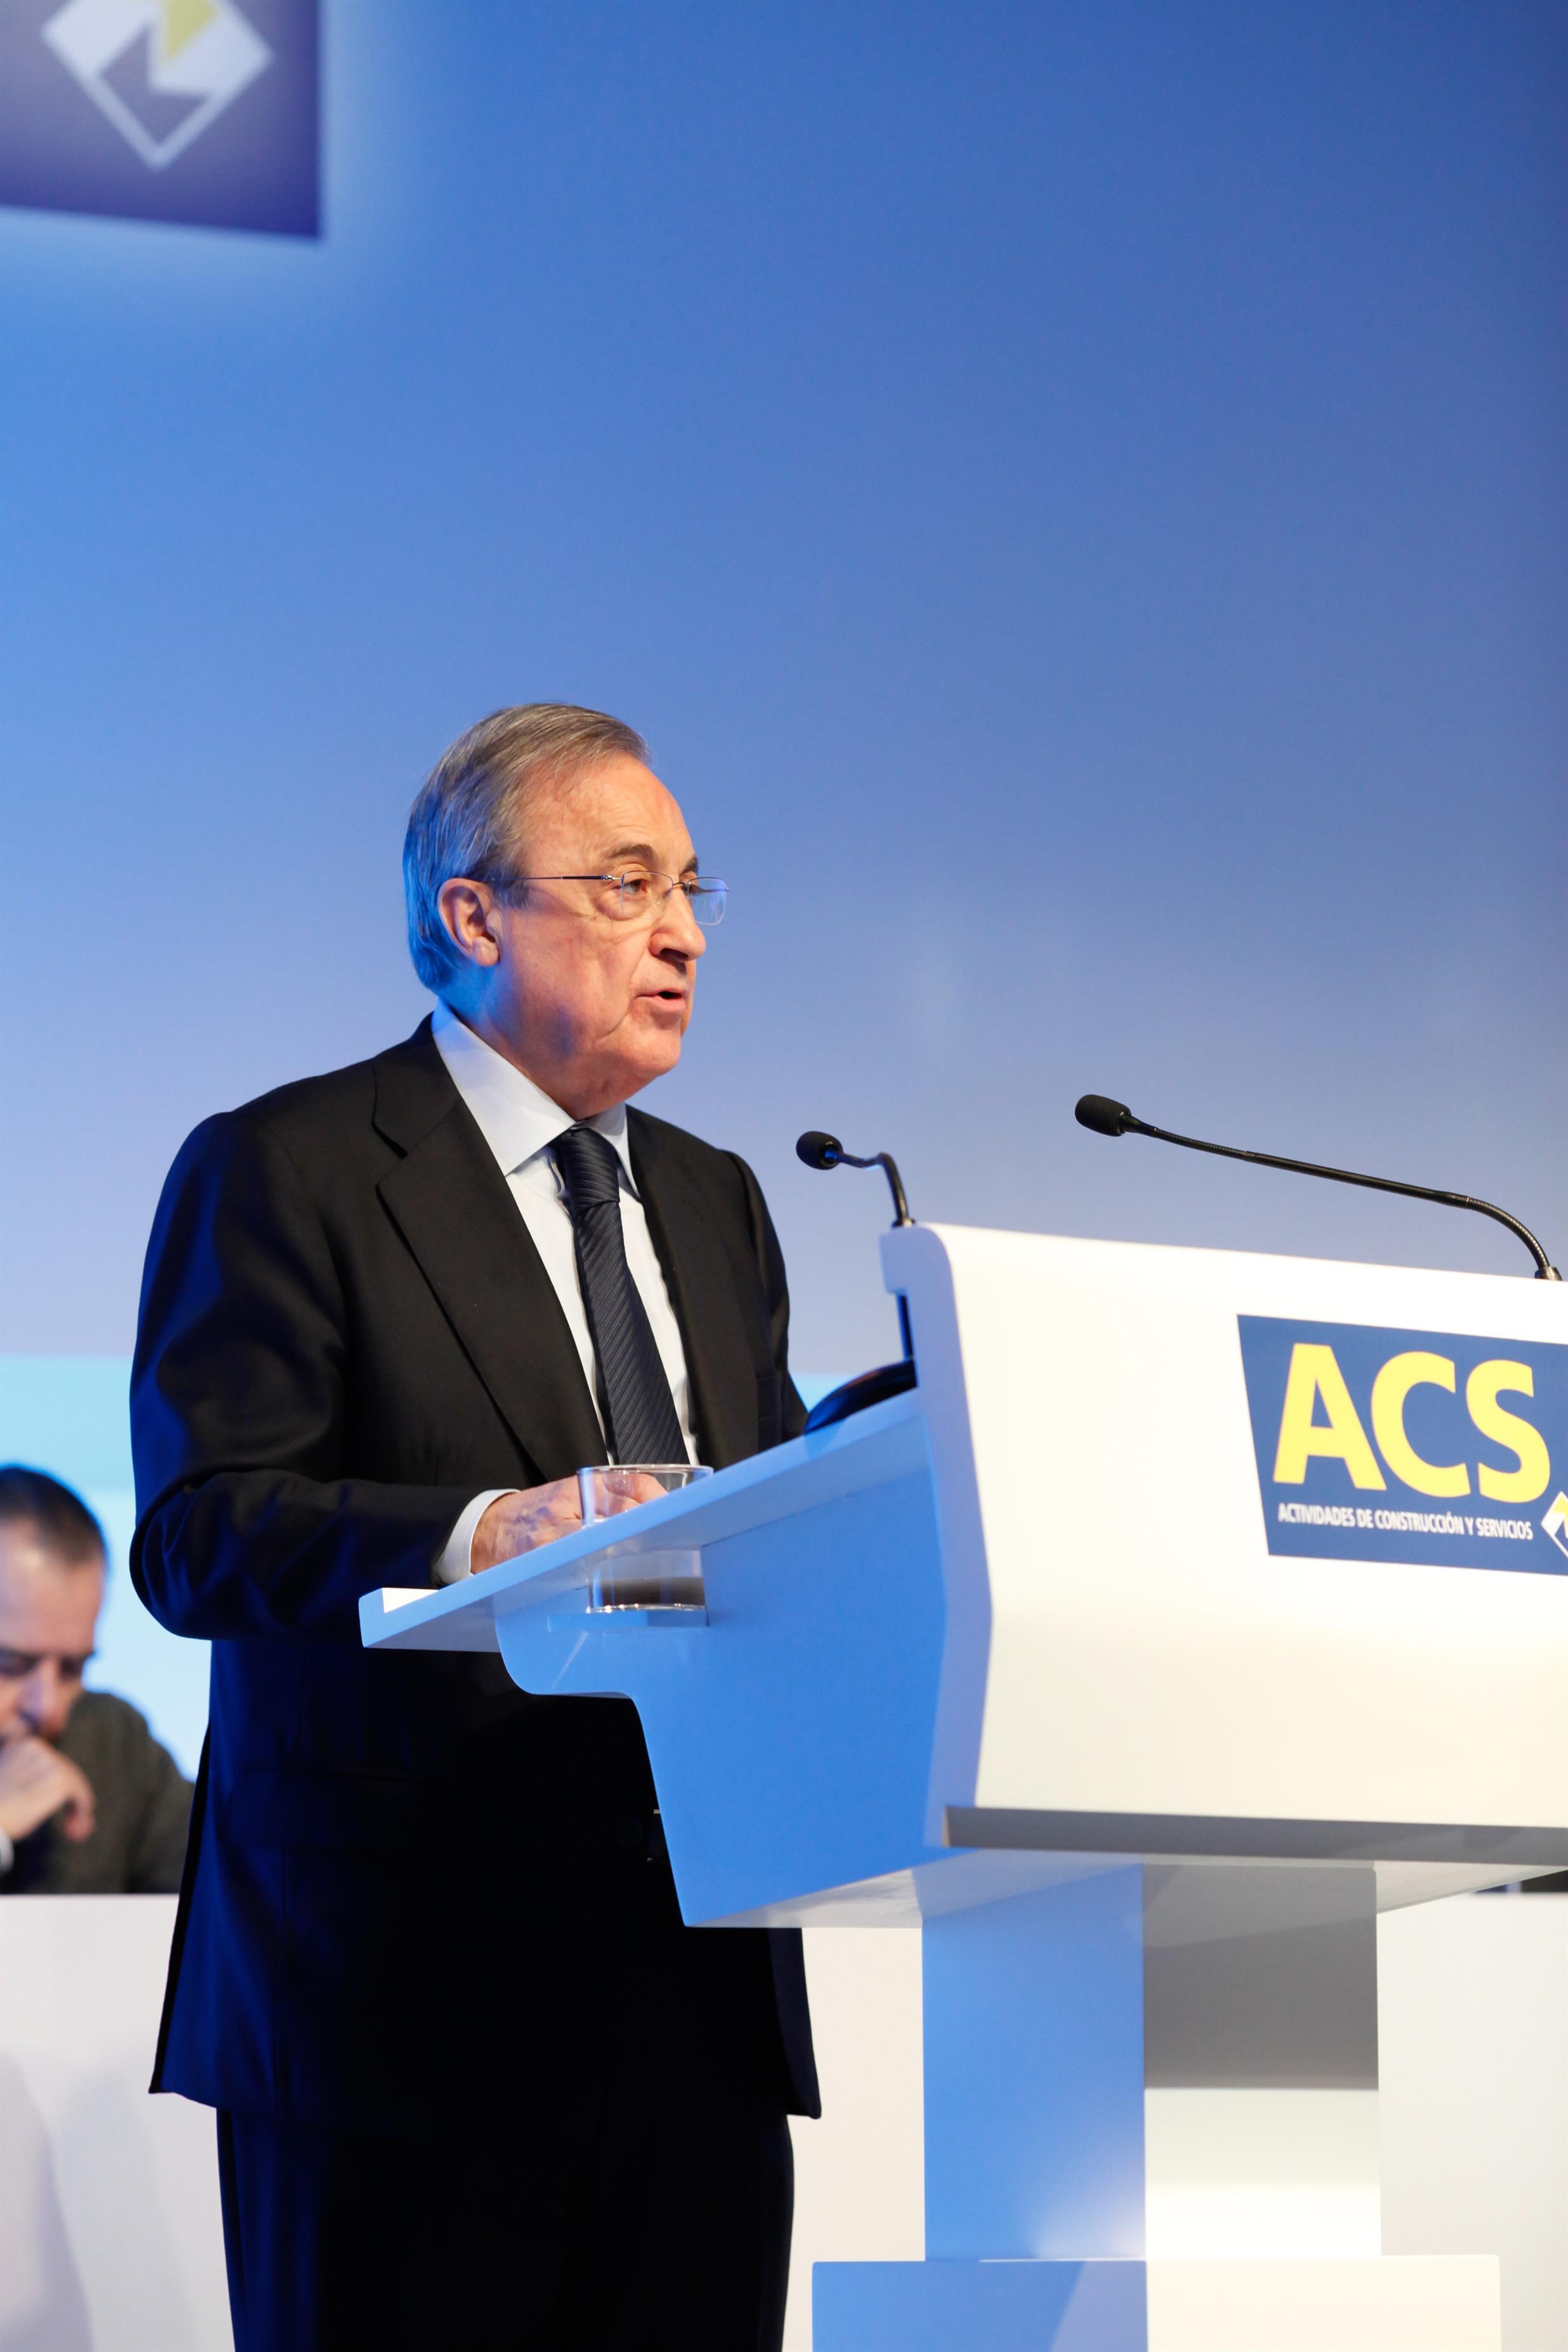 Kepler reduce un 6% la valoración de ACS, hasta 42 euros por acción